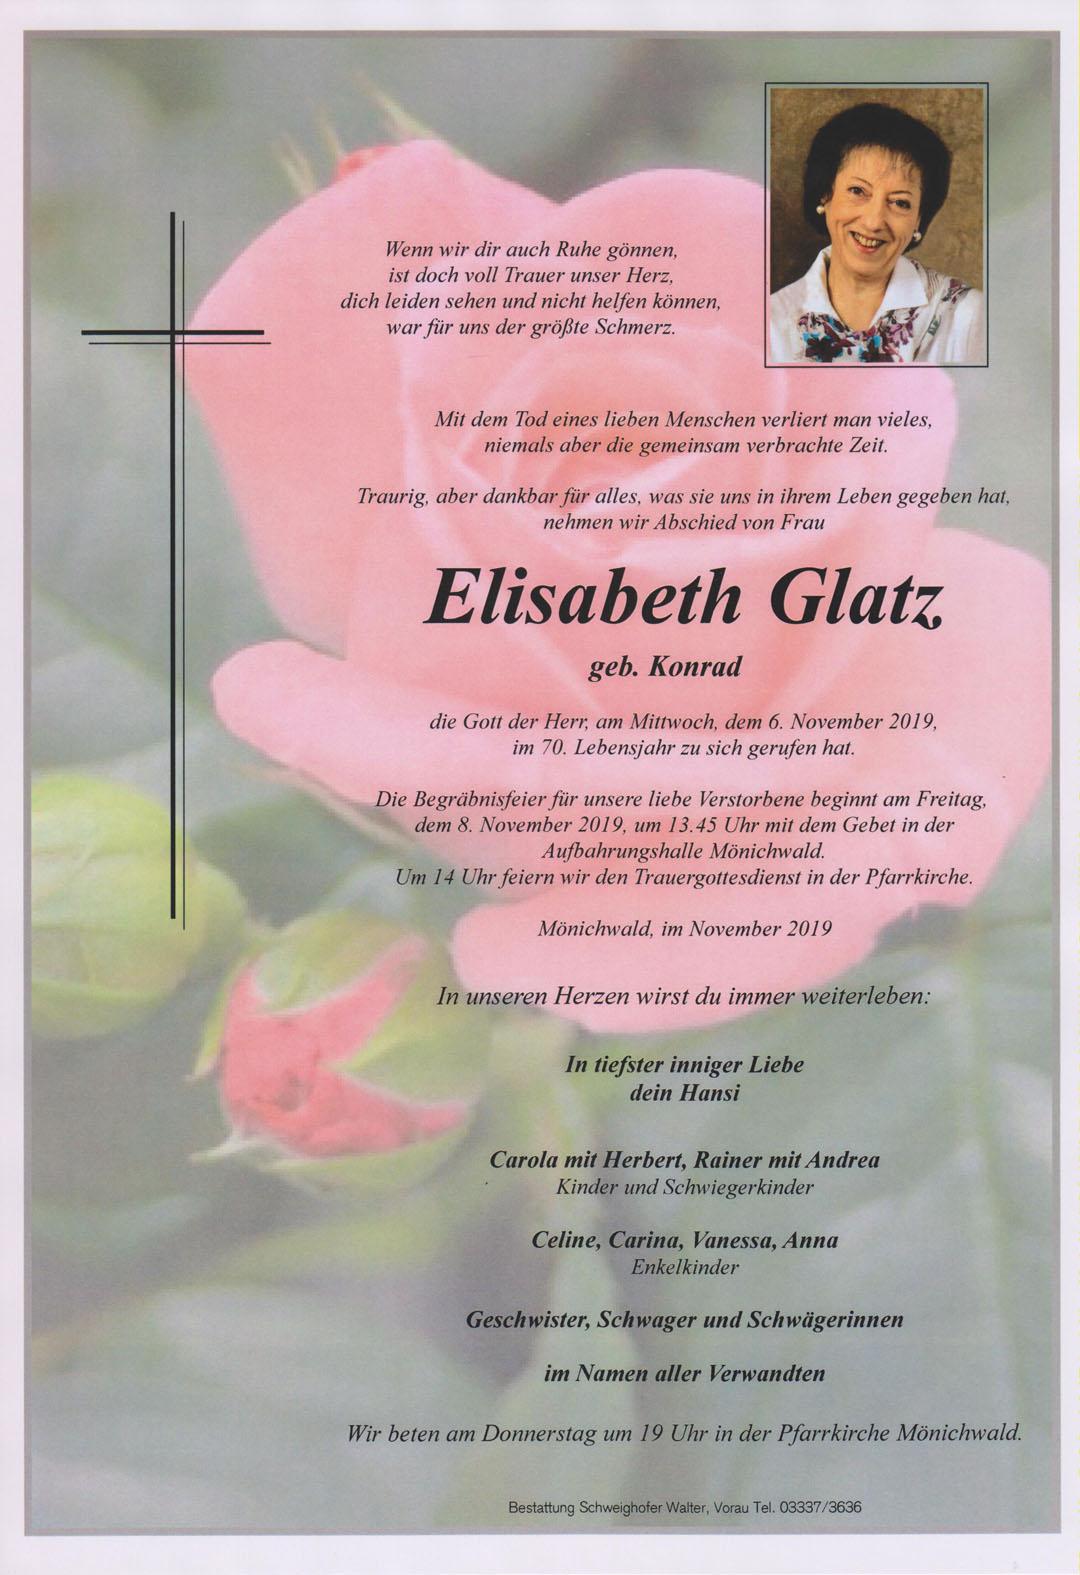 Elisabeth Glatz